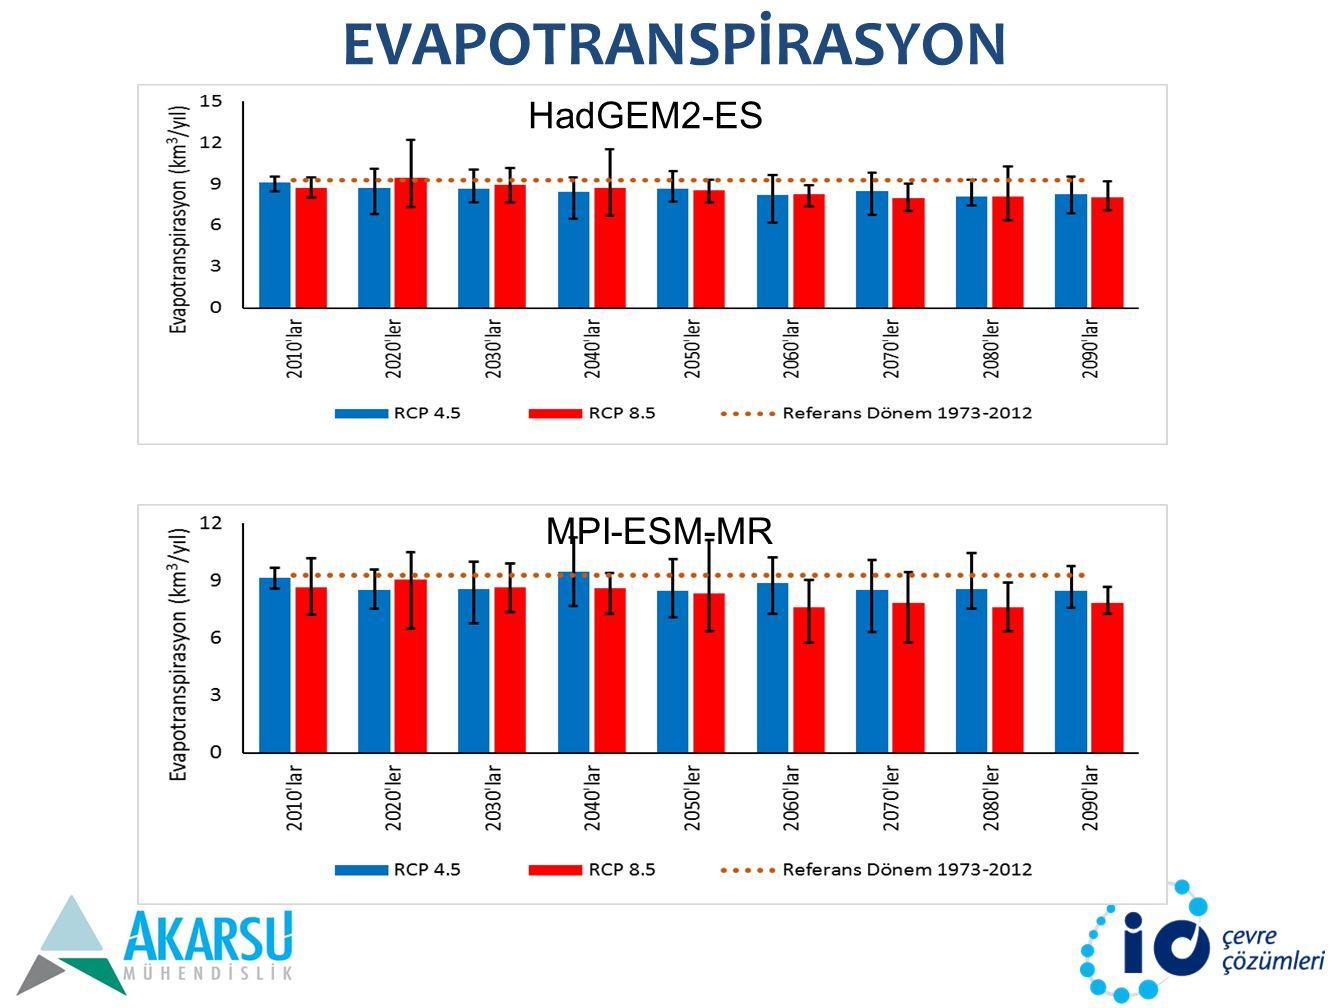 EVAPOTRANSPİRASYON HadGEM2-ES MPI-ESM-MR